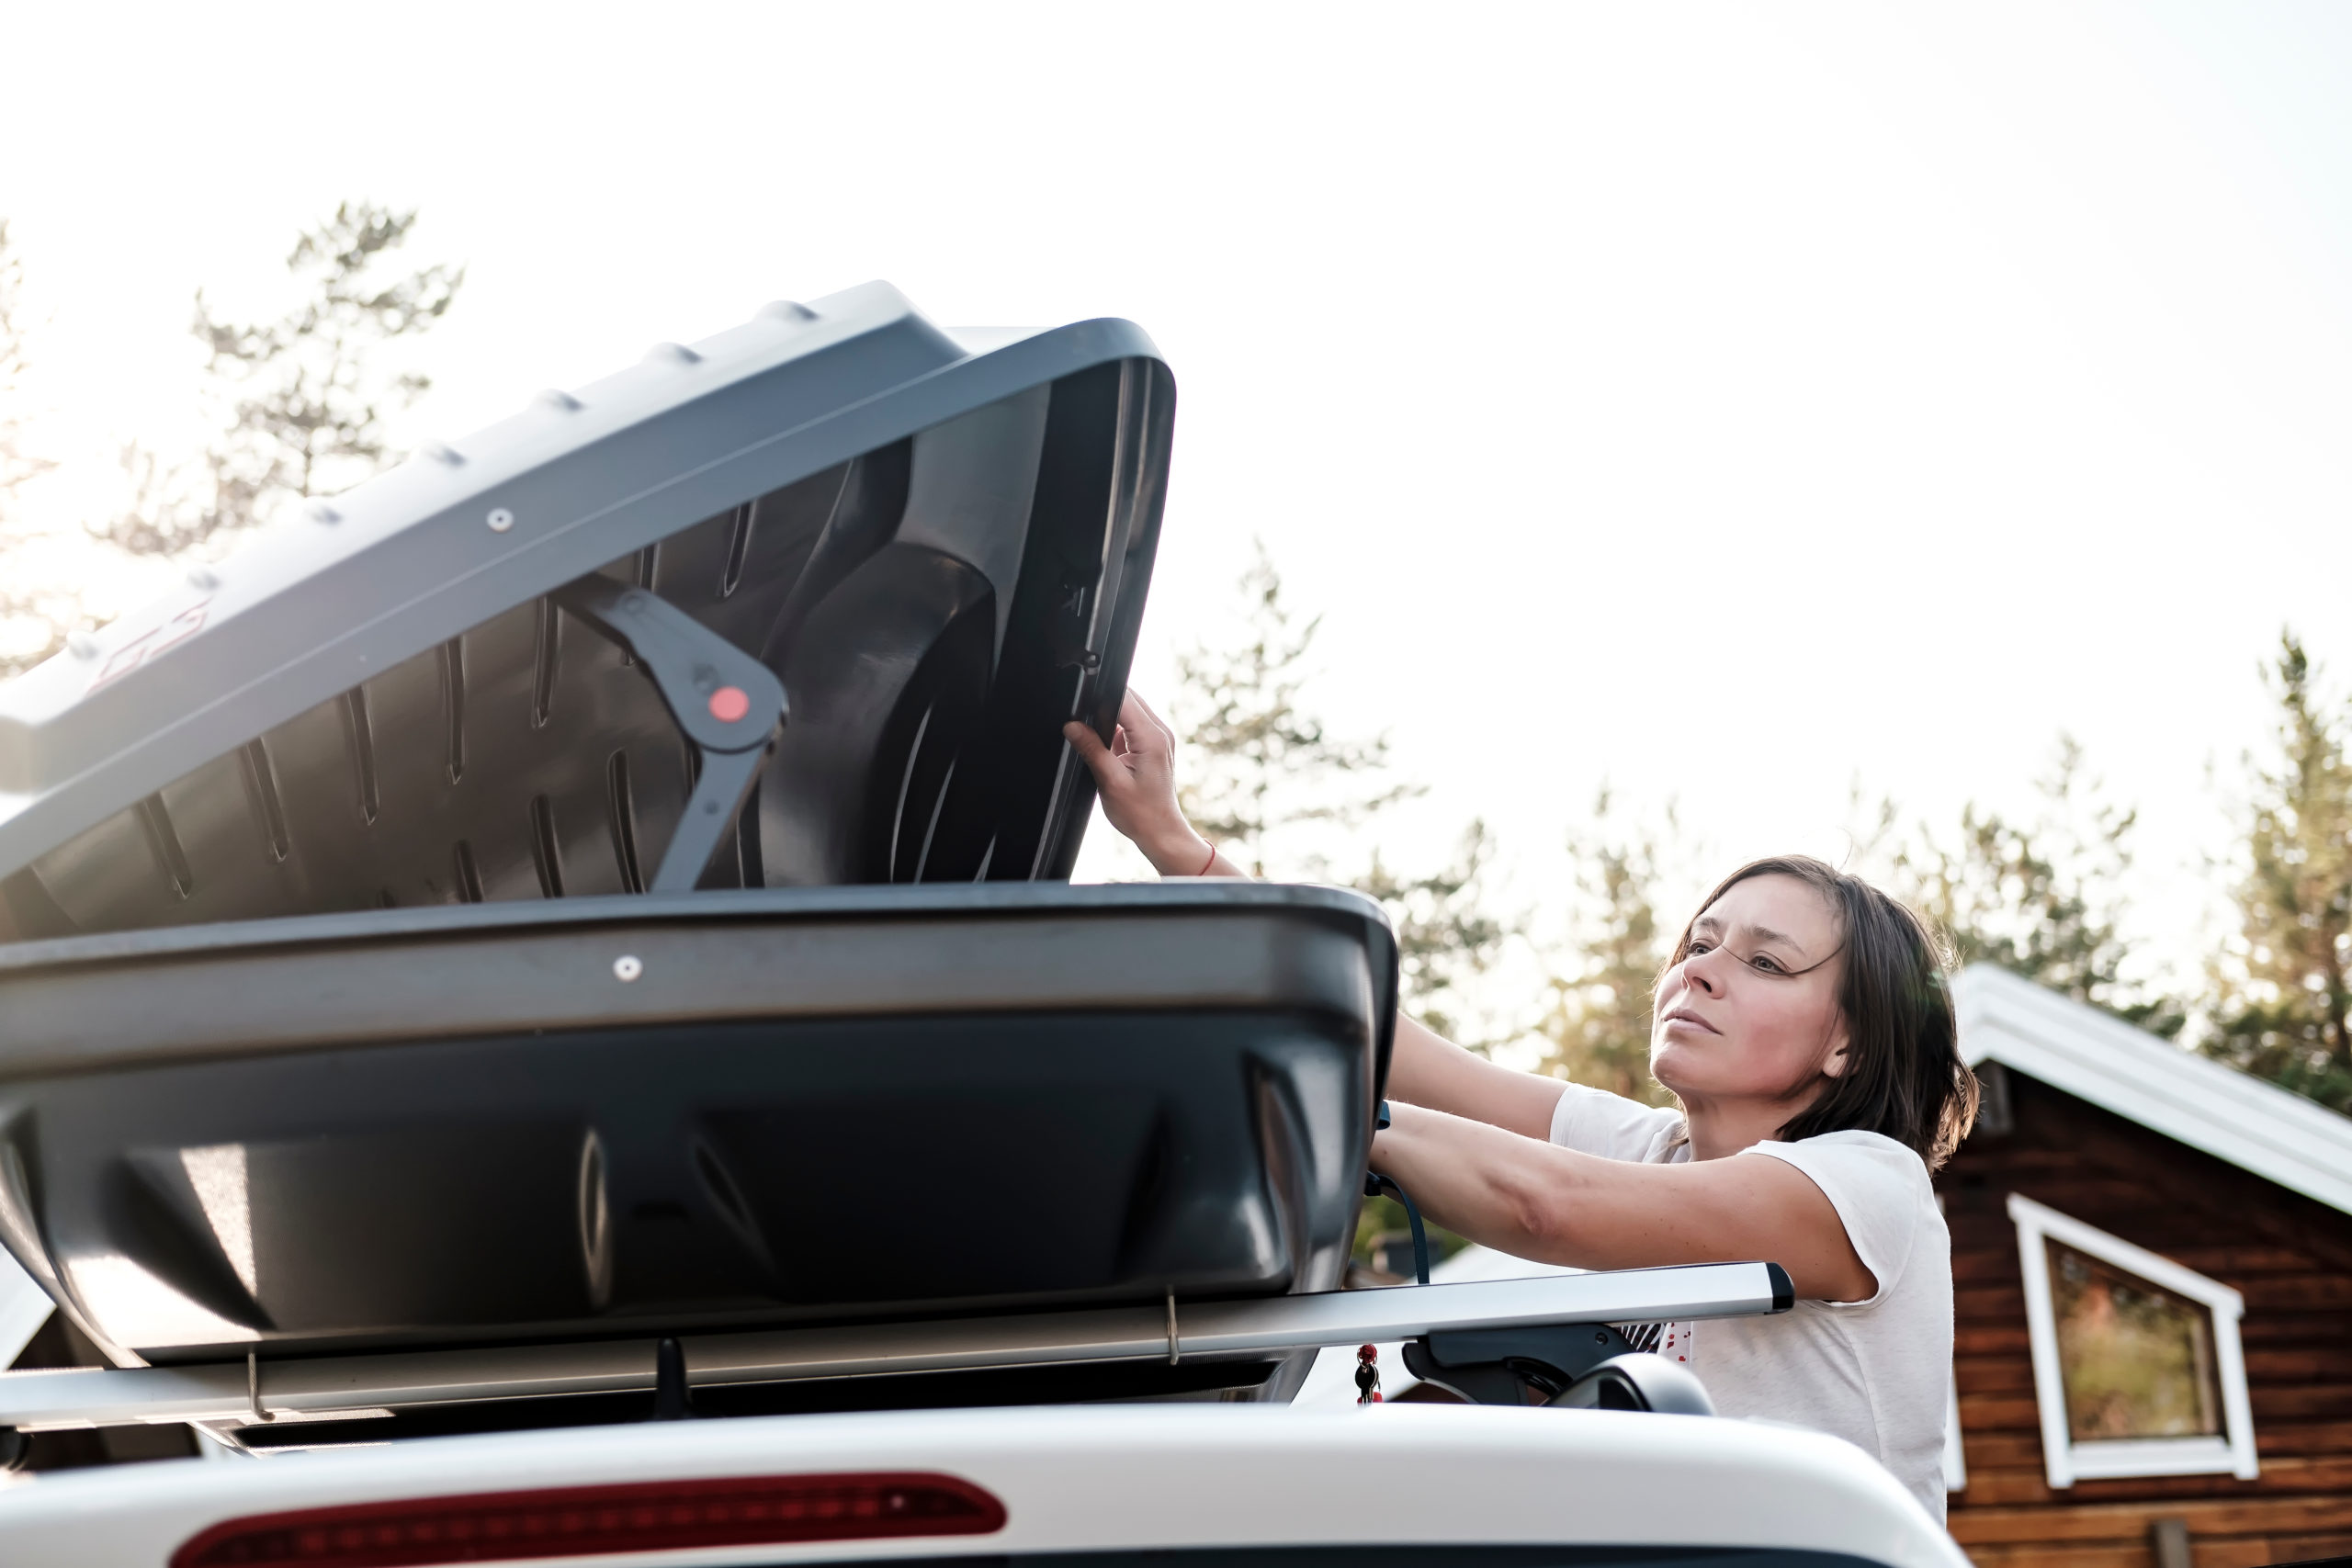 women opening cargo box